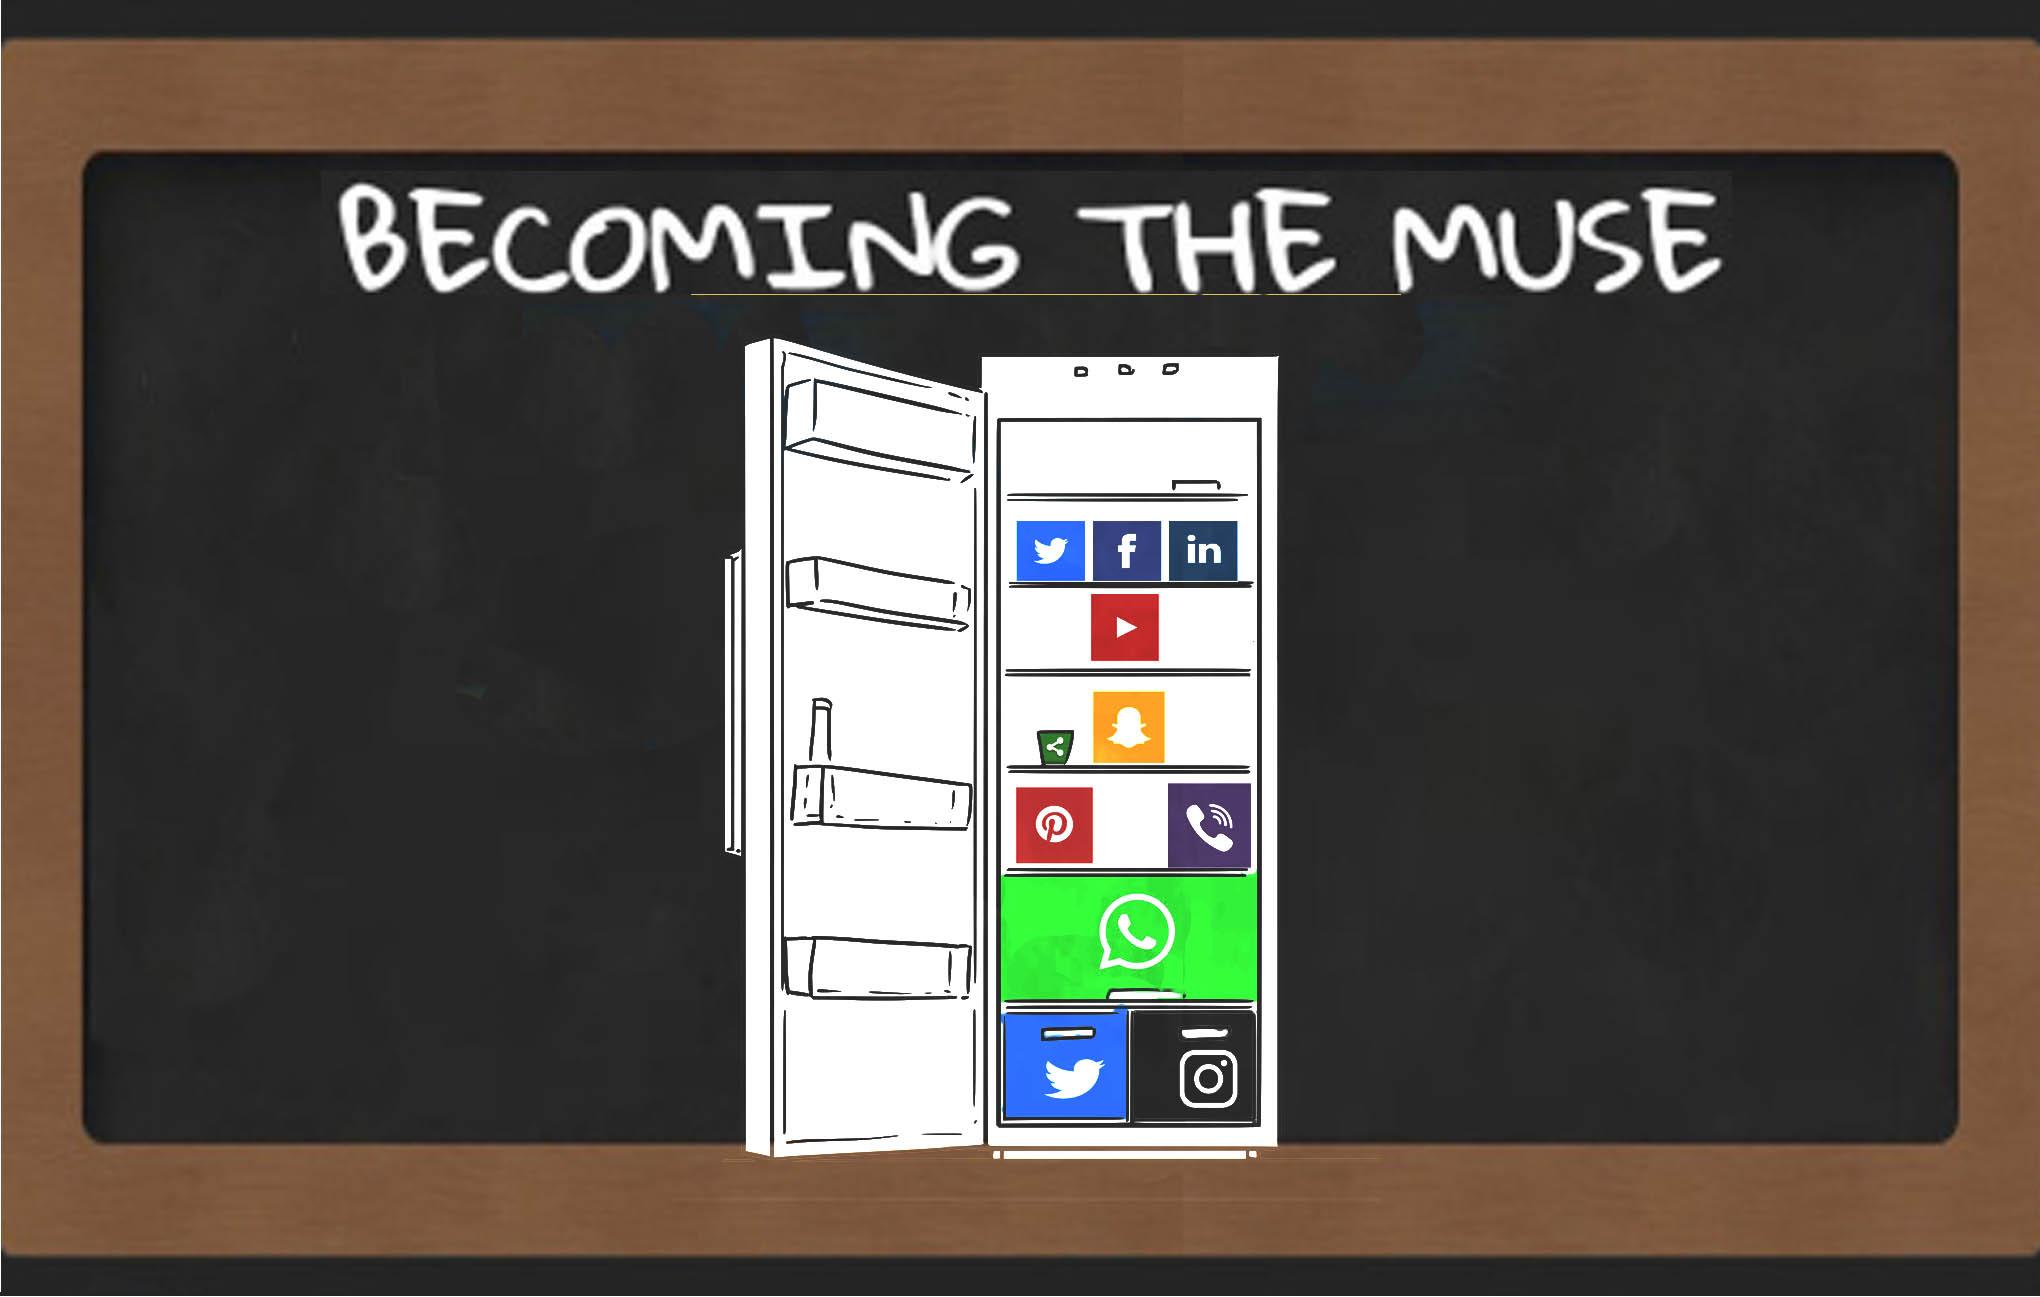 Social media as a analogy